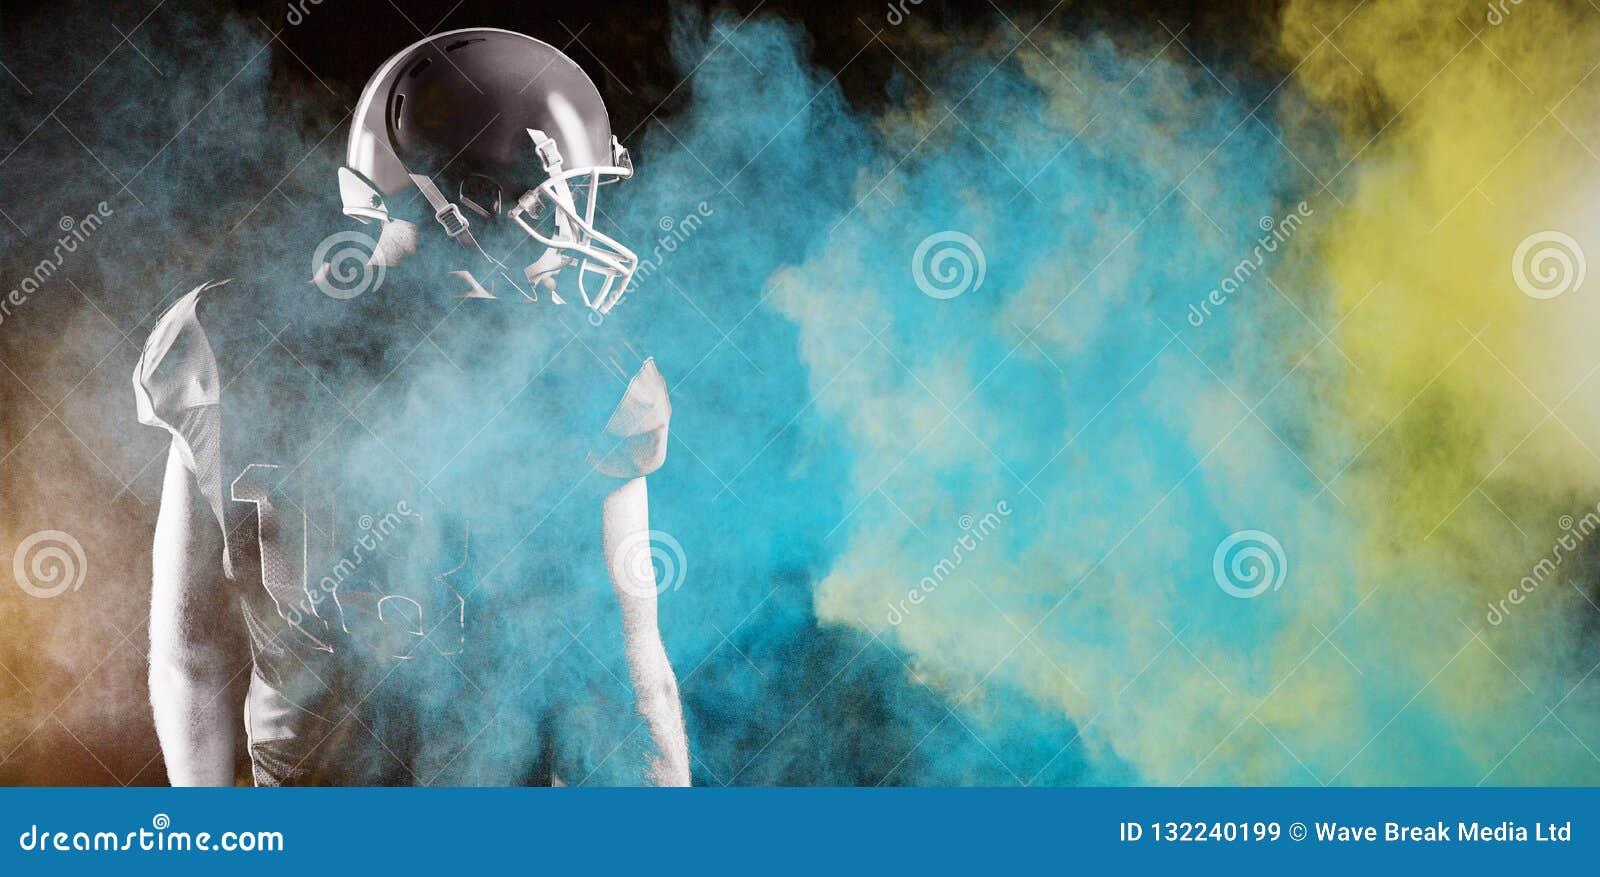 Composite image of splashing of blue color powder